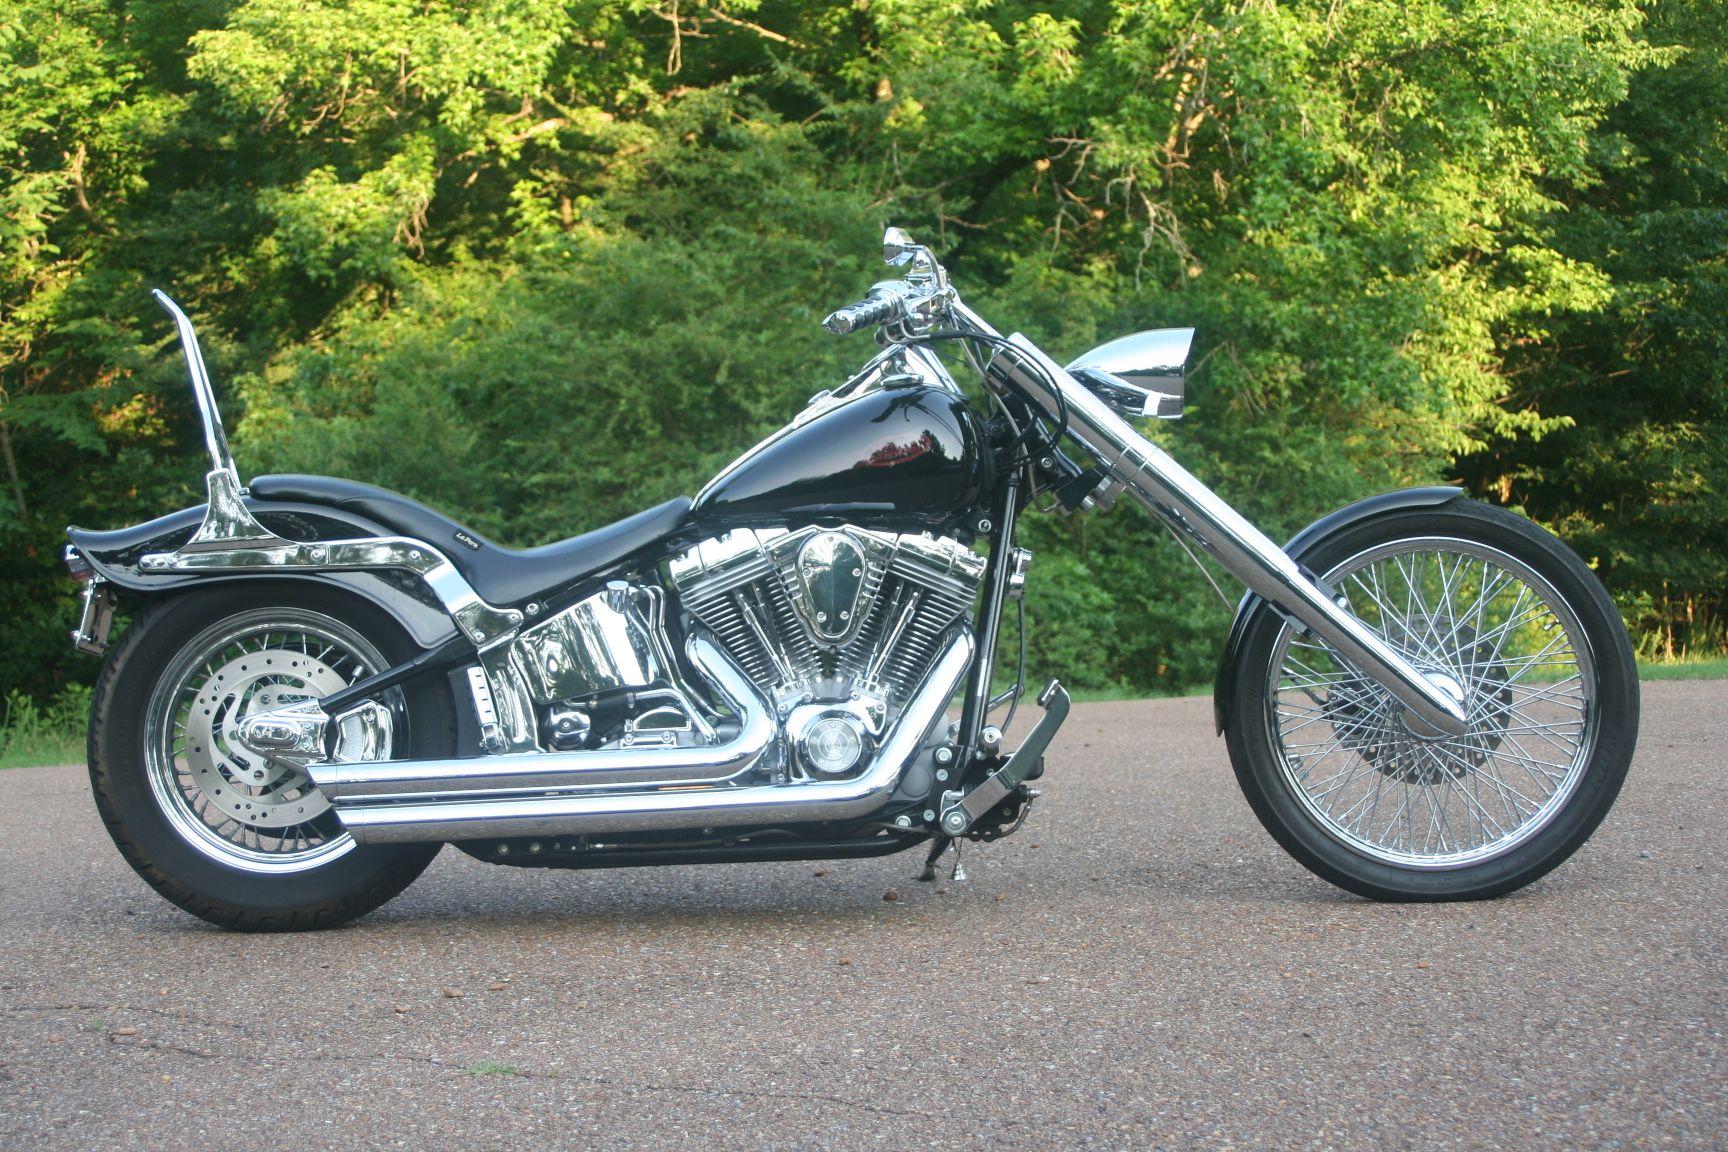 Harley Davidson Choppers Google Search Harley Davidson